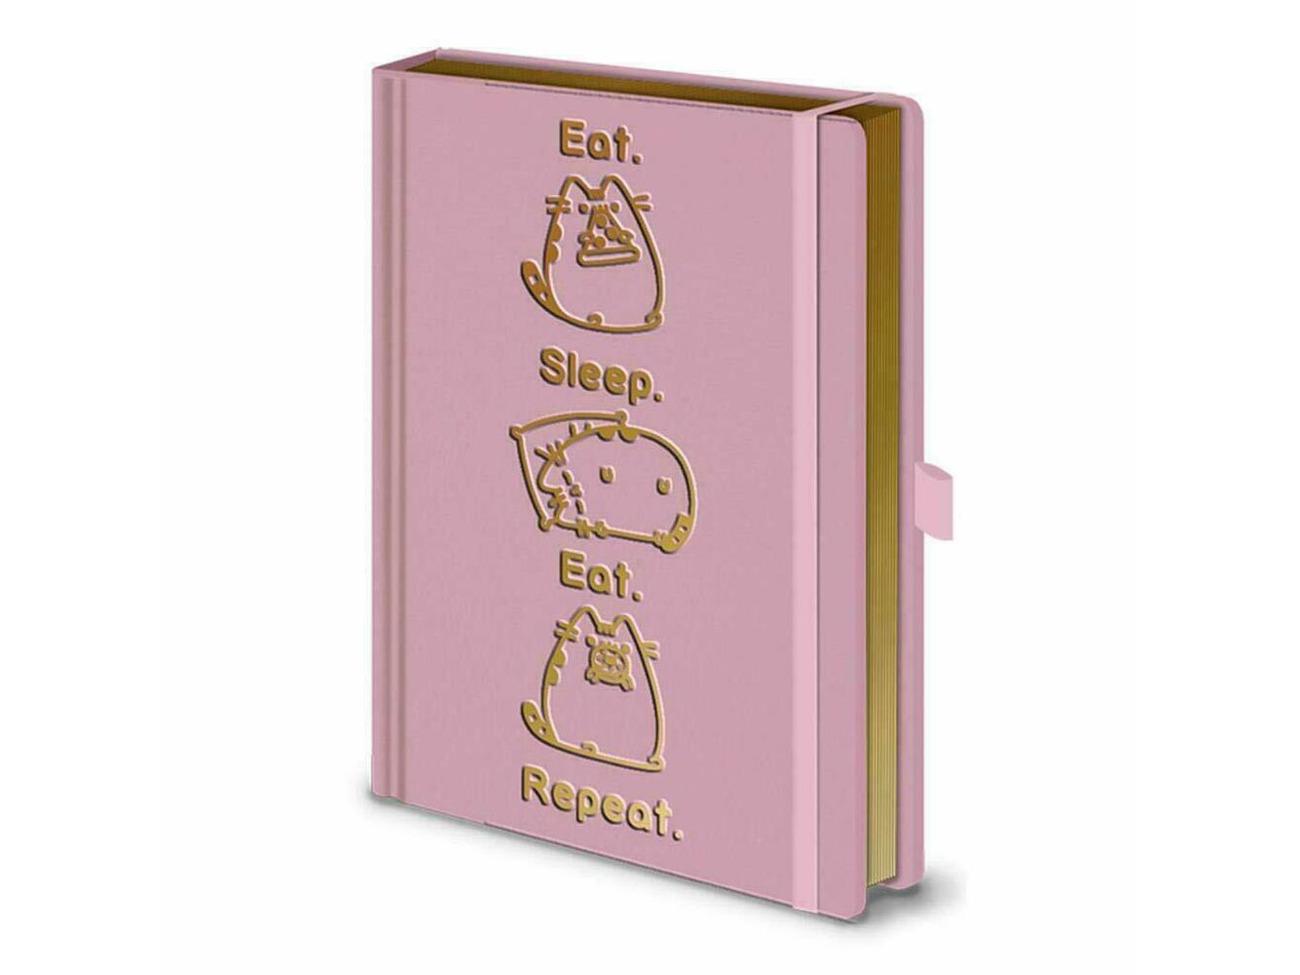 Sleeping Pusheen Pusheen Mini Vinyl